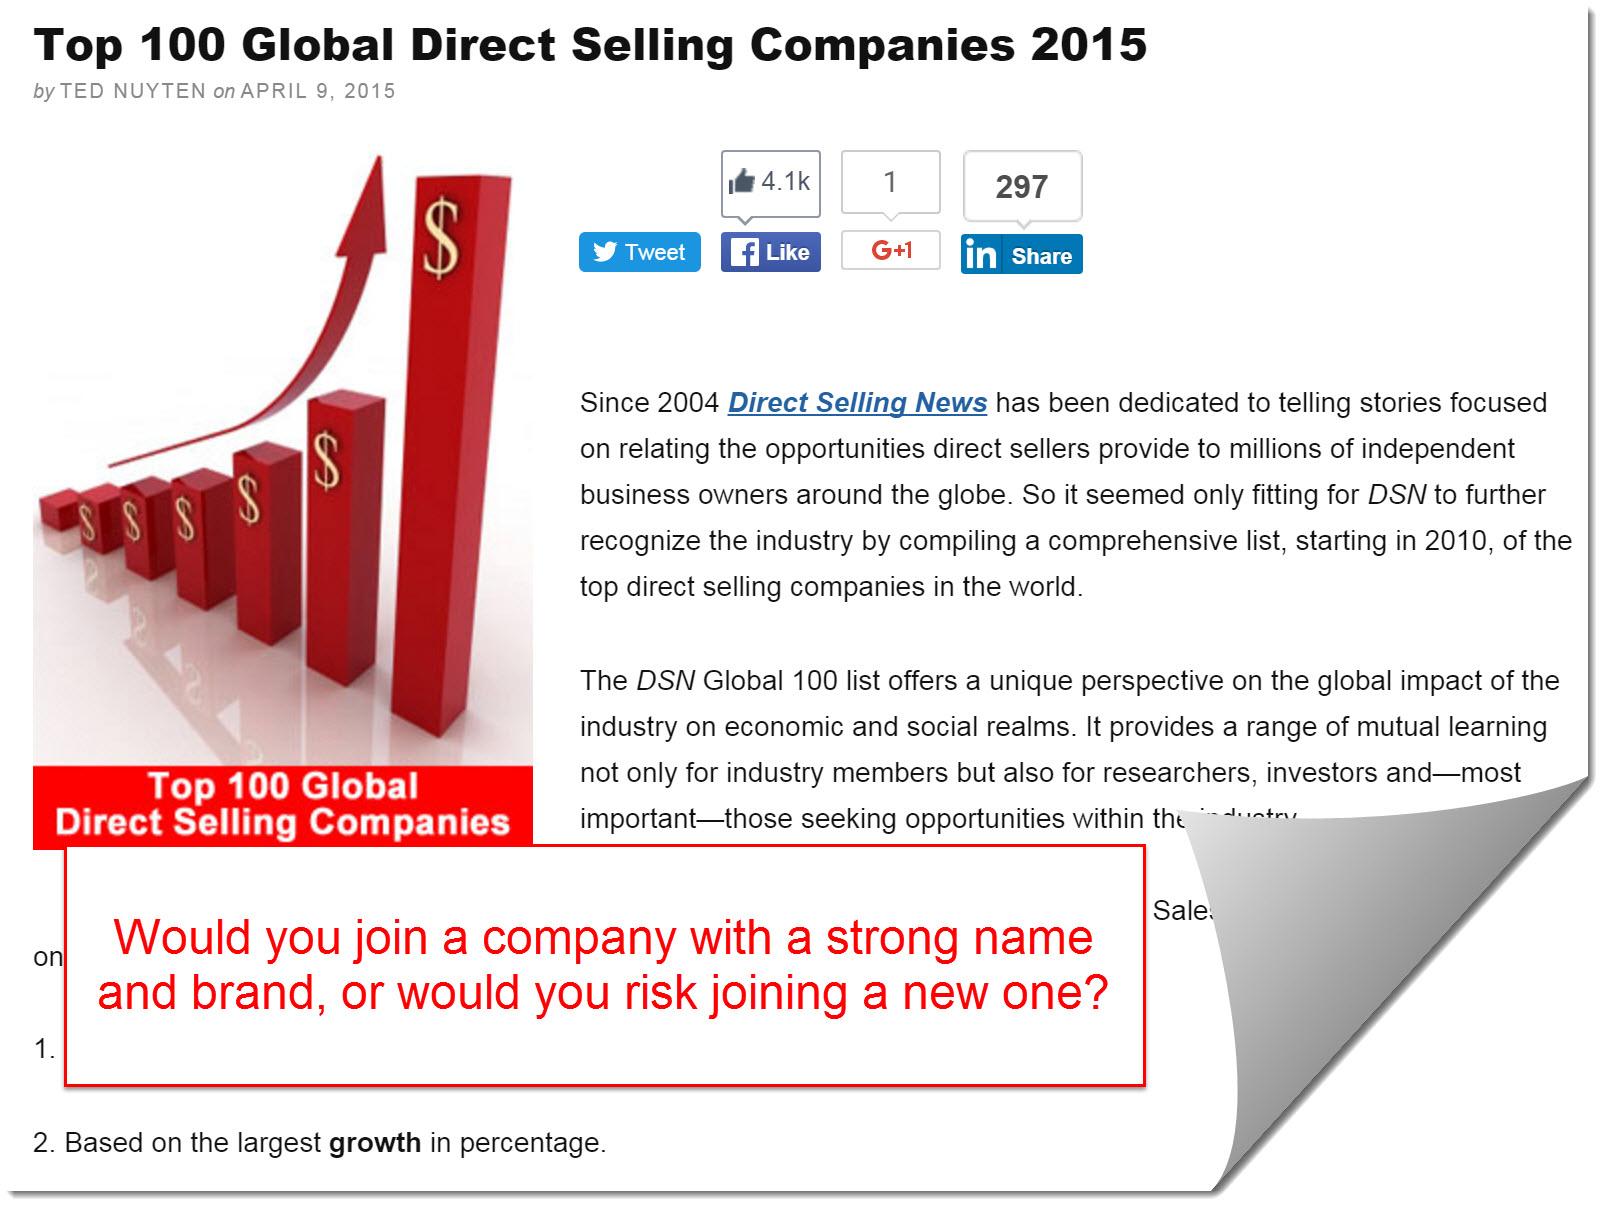 Top 100 MLM companies 2015